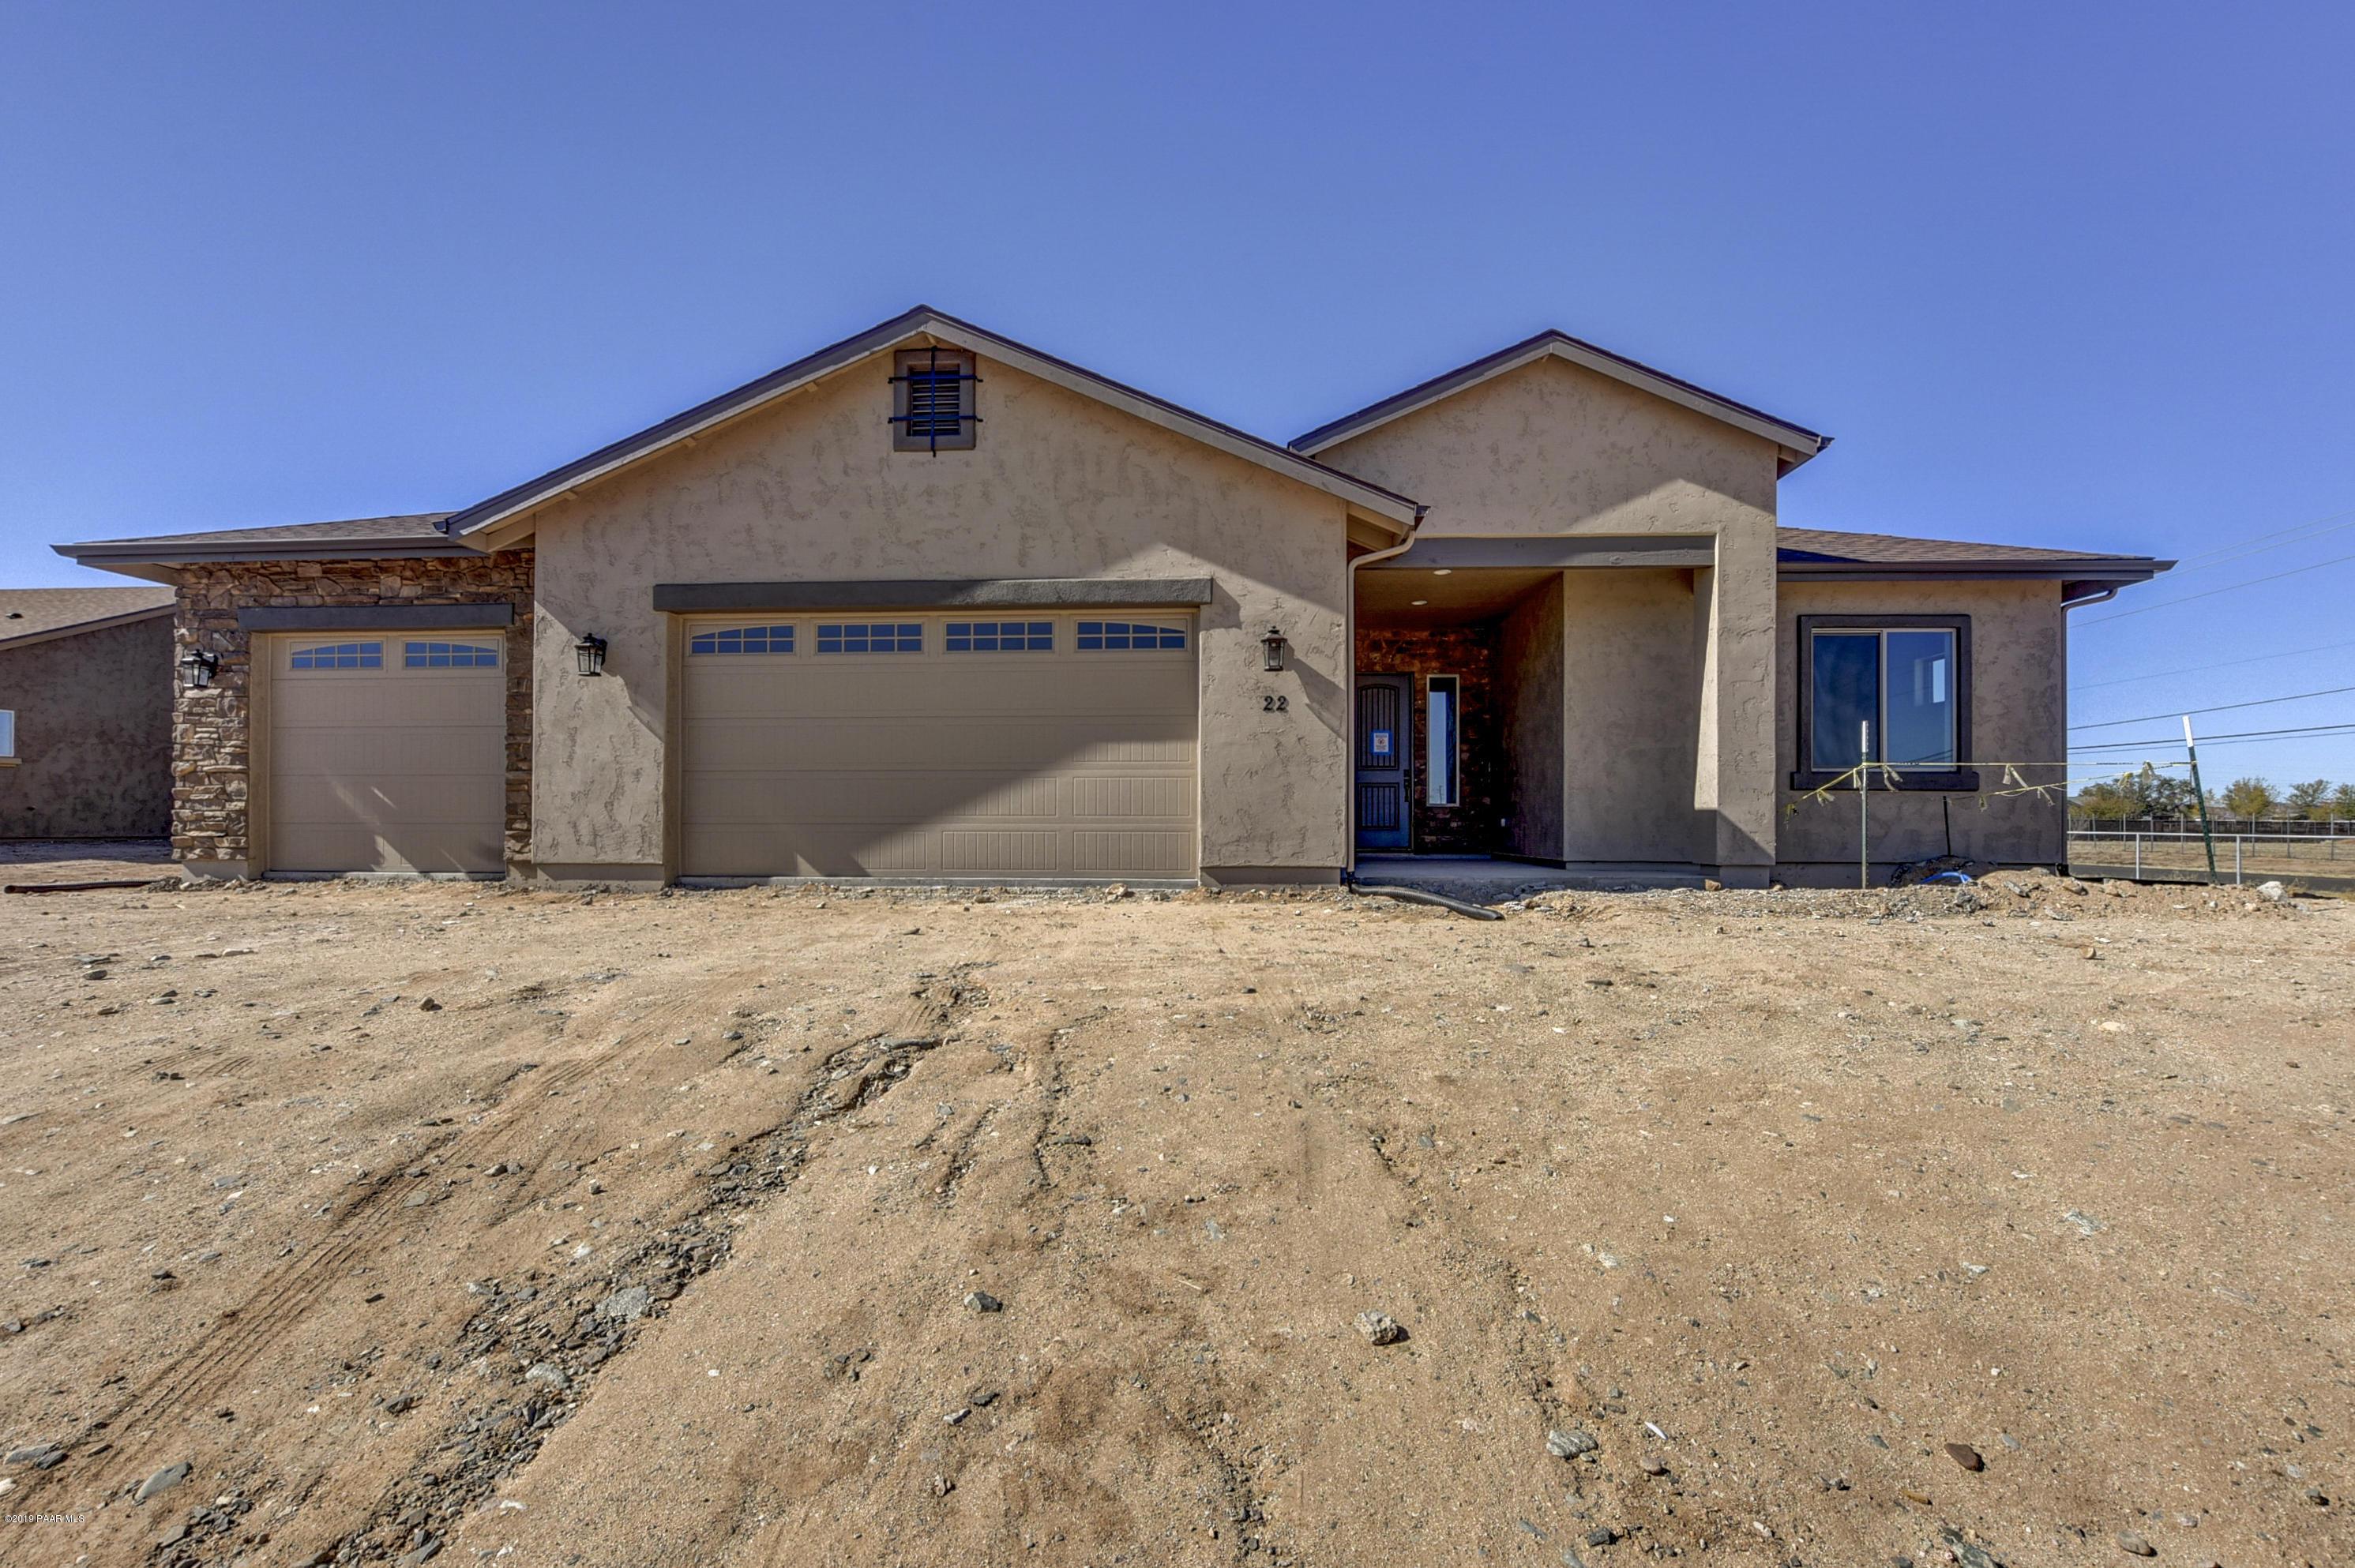 Photo of 22 Smith, Chino Valley, AZ 86323